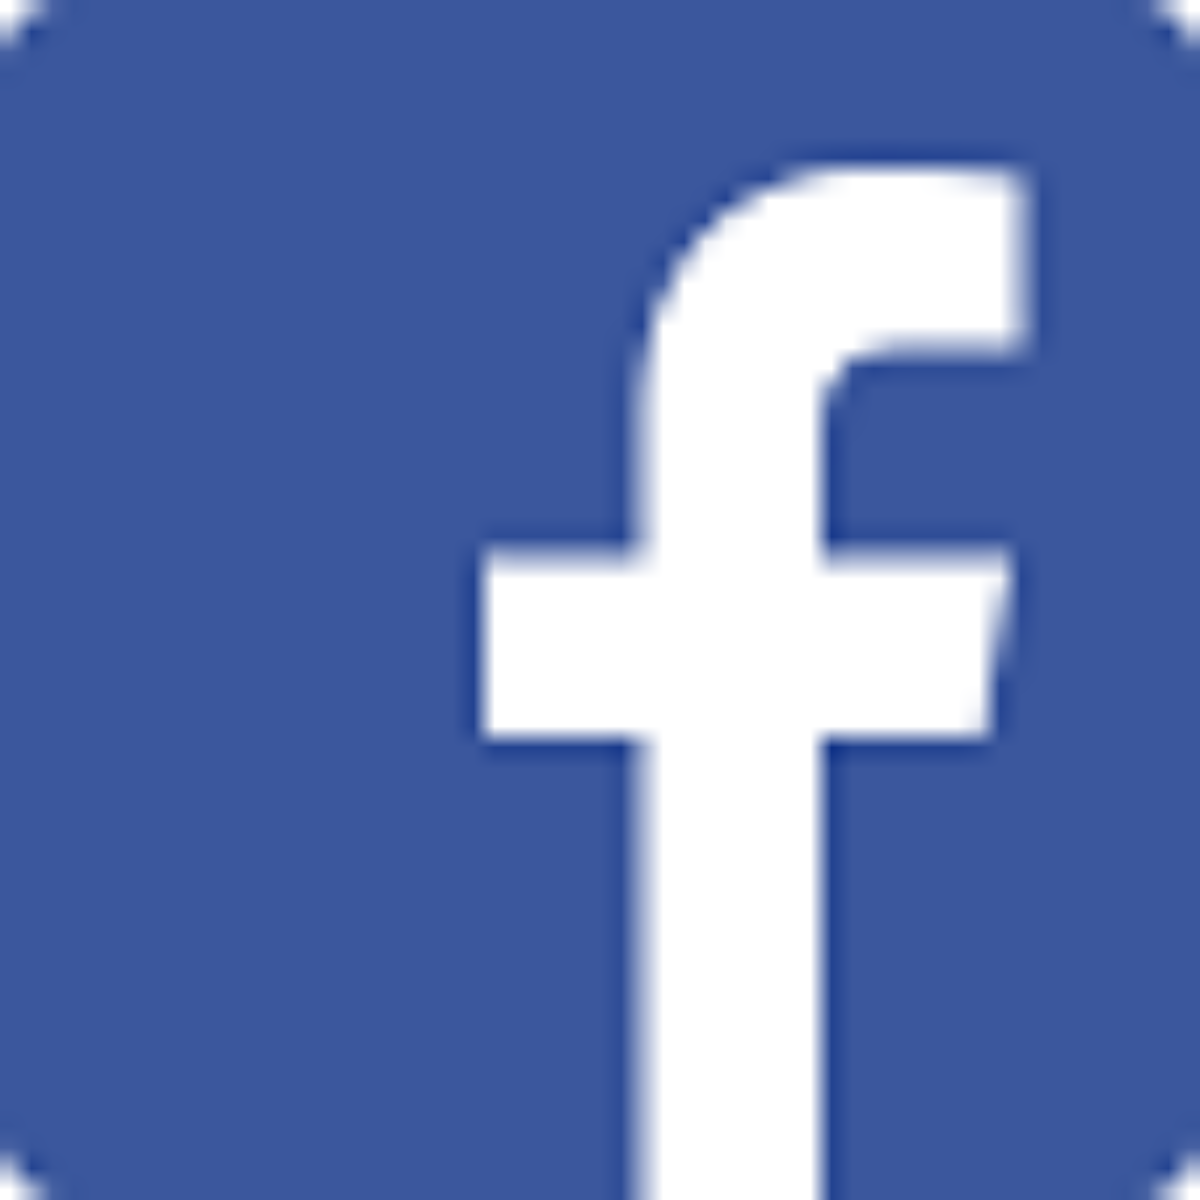 FB-f-Logo__blue_114 – Kopi.png